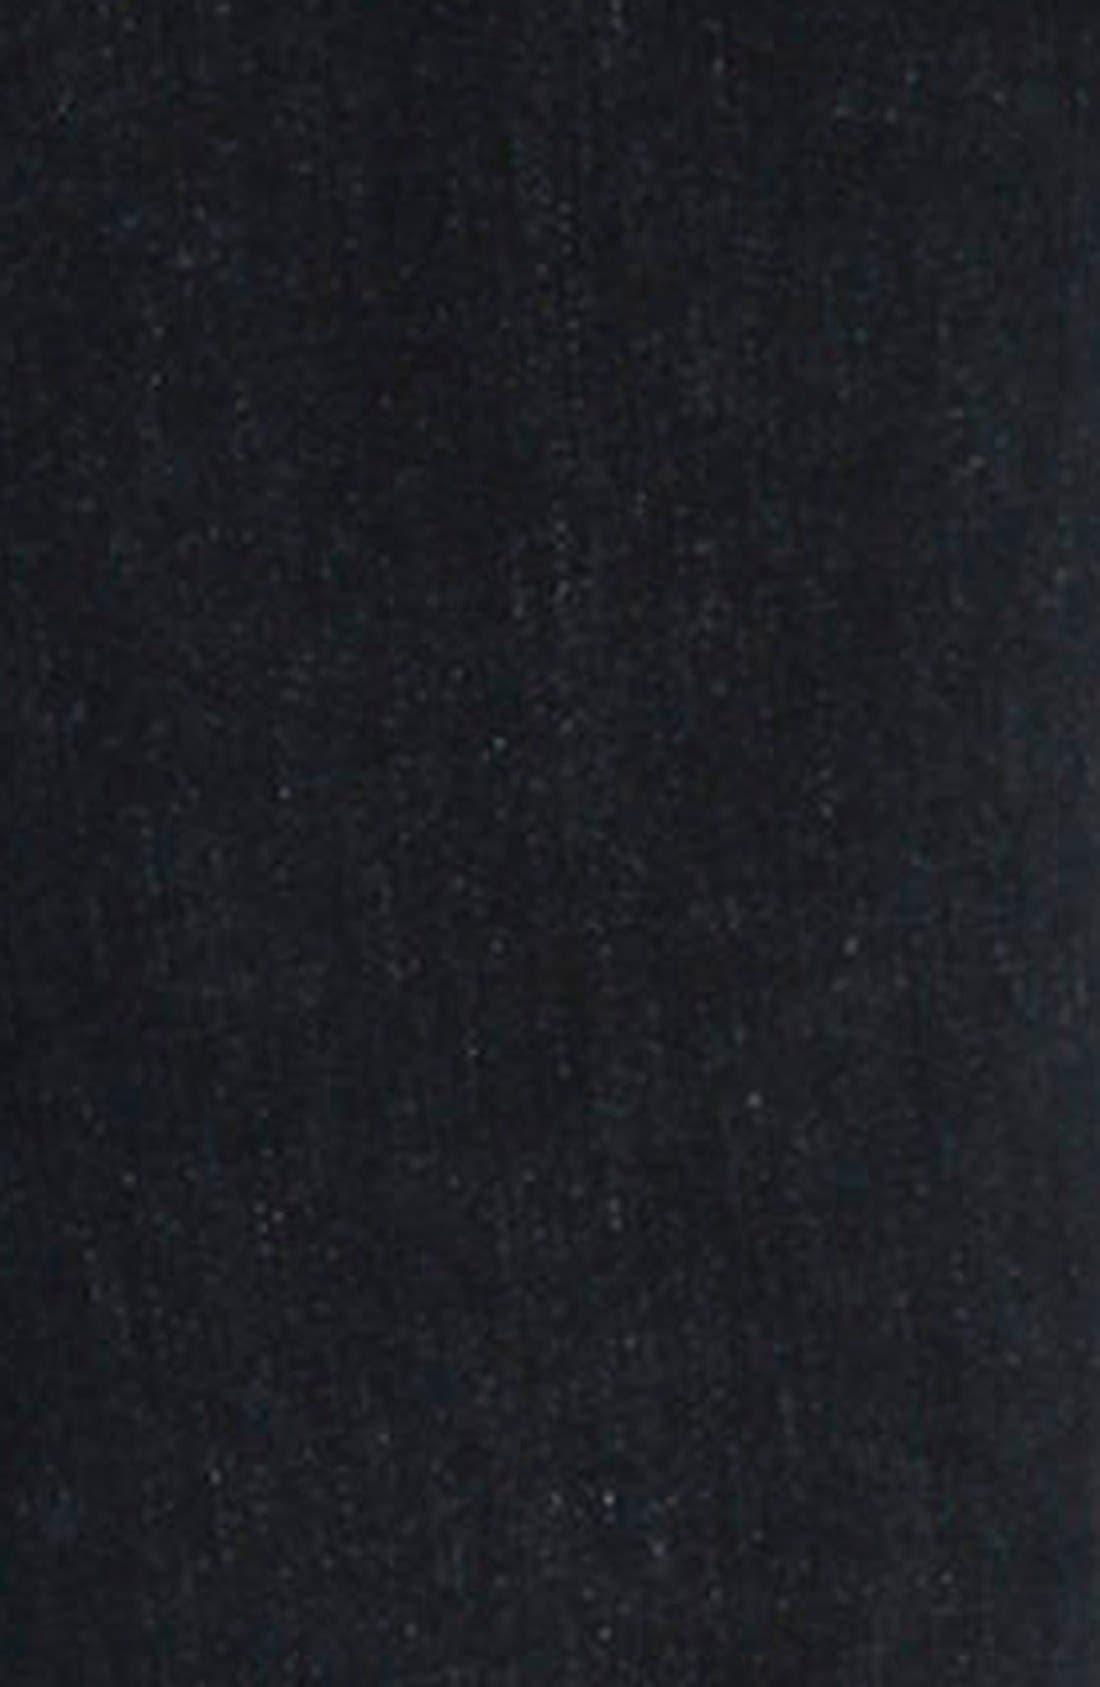 Alternate Image 4  - PAIGE Transcend Verdugo Ripped Ankle Ultra Skinny Jeans (Kaleea Destructed)